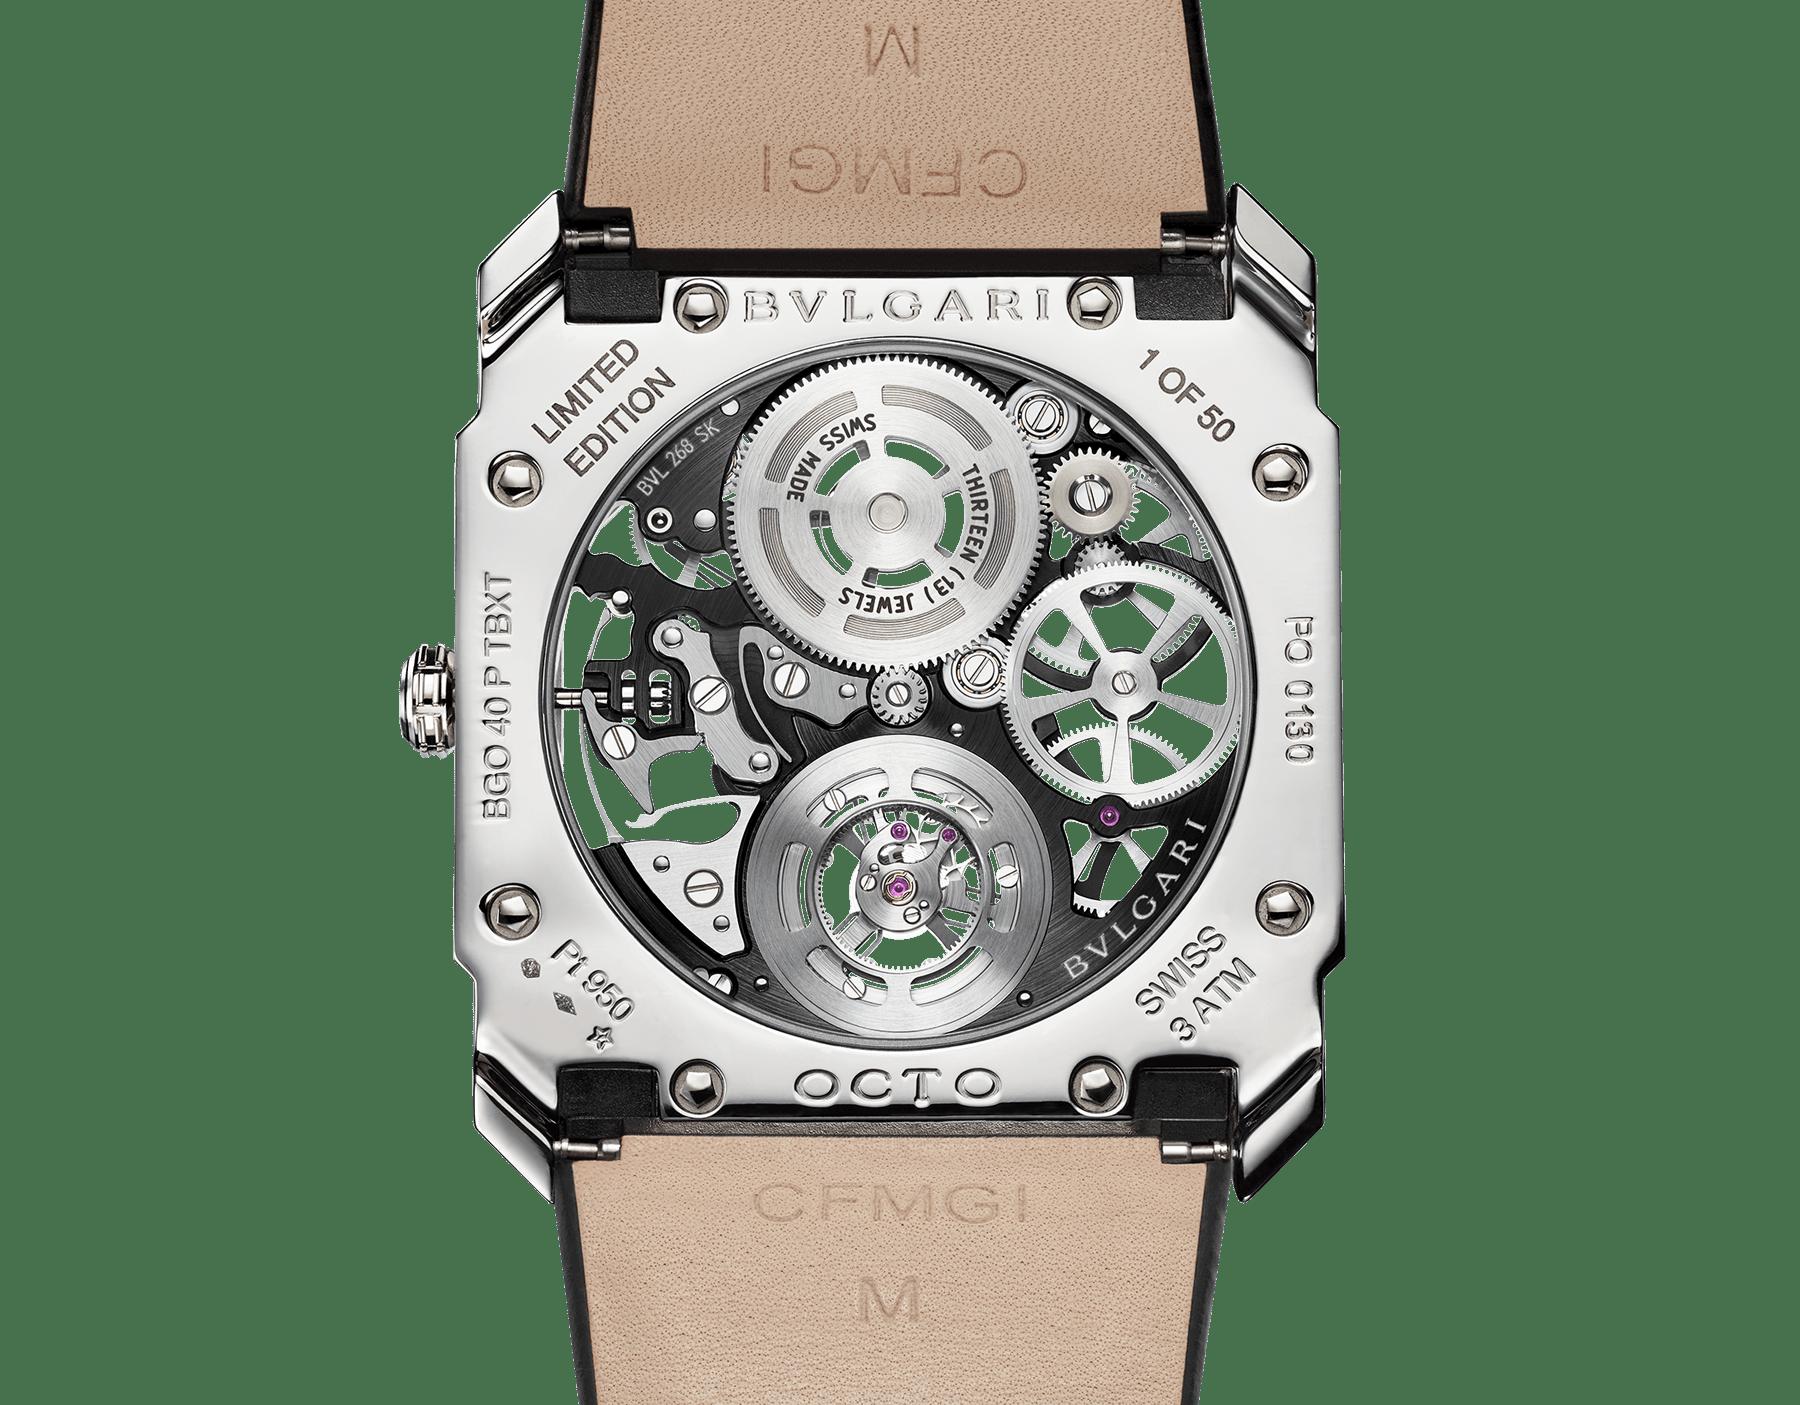 Octo Finissimo Tourbillon Squelette 腕錶搭載超薄鏤空機械機芯,手動上鍊,滾珠軸承系統,鉑金錶殼,透明錶盤,黑色鱷魚皮錶帶。 102719 image 4